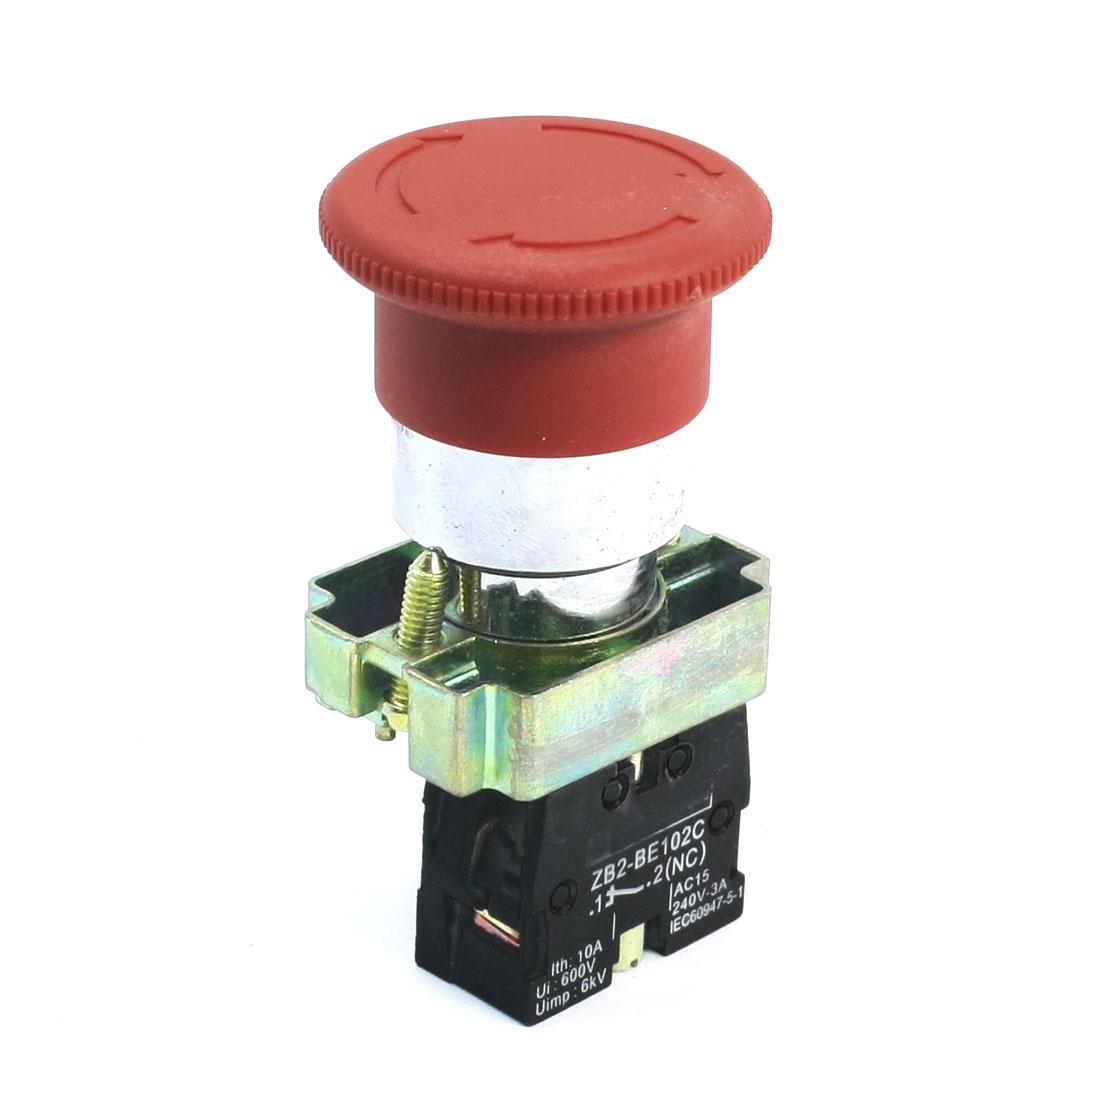 AC 240V 3A SPST 1NC Circuit Control Self-Locking Mushroom Pushbutton Switch